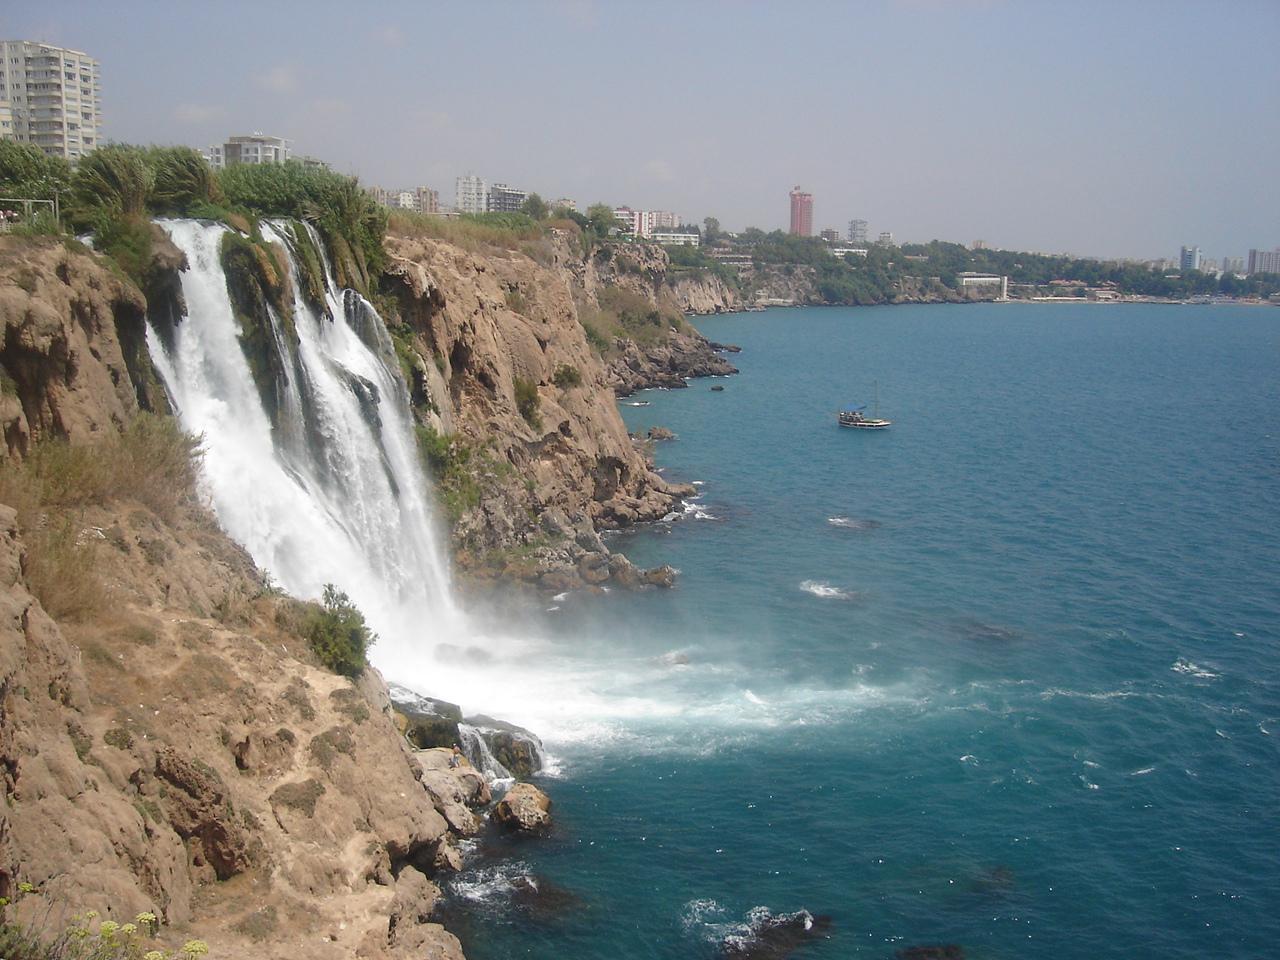 http://famouswonders.com/wp-content/uploads/2010/03/Antalya.jpg